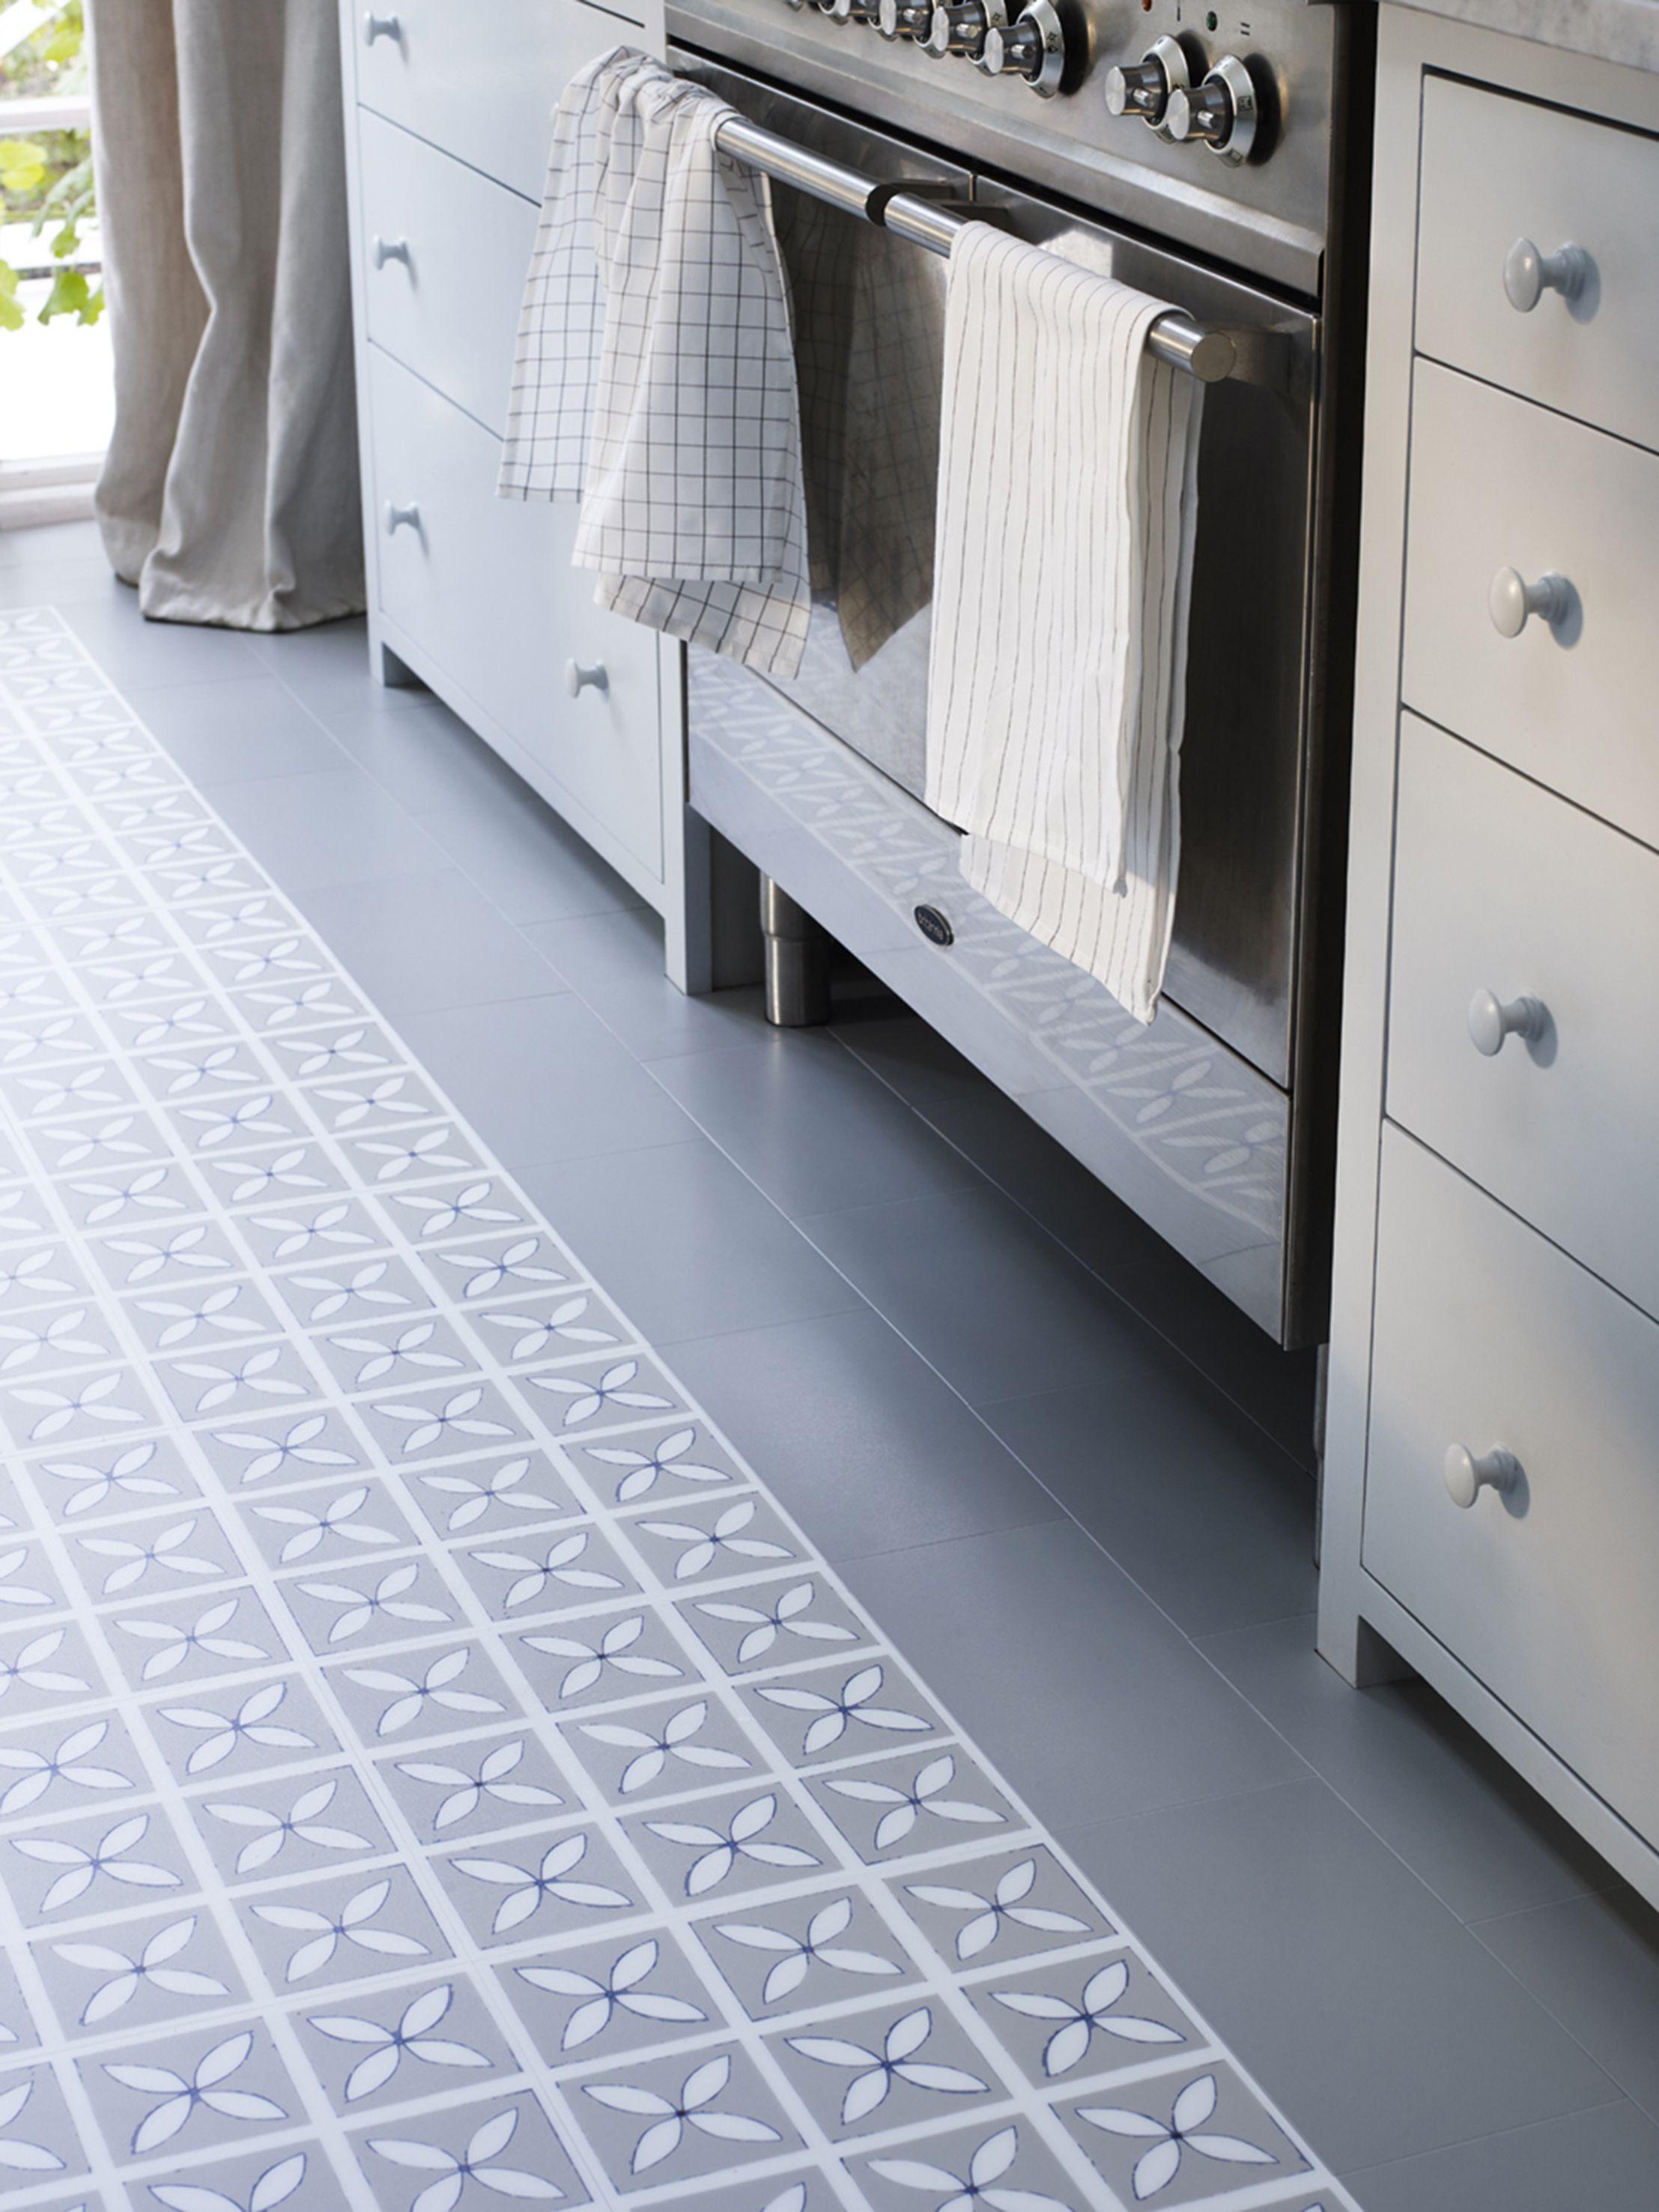 Lattice Pebble Grey Flooring design by Dee Hardwicke for